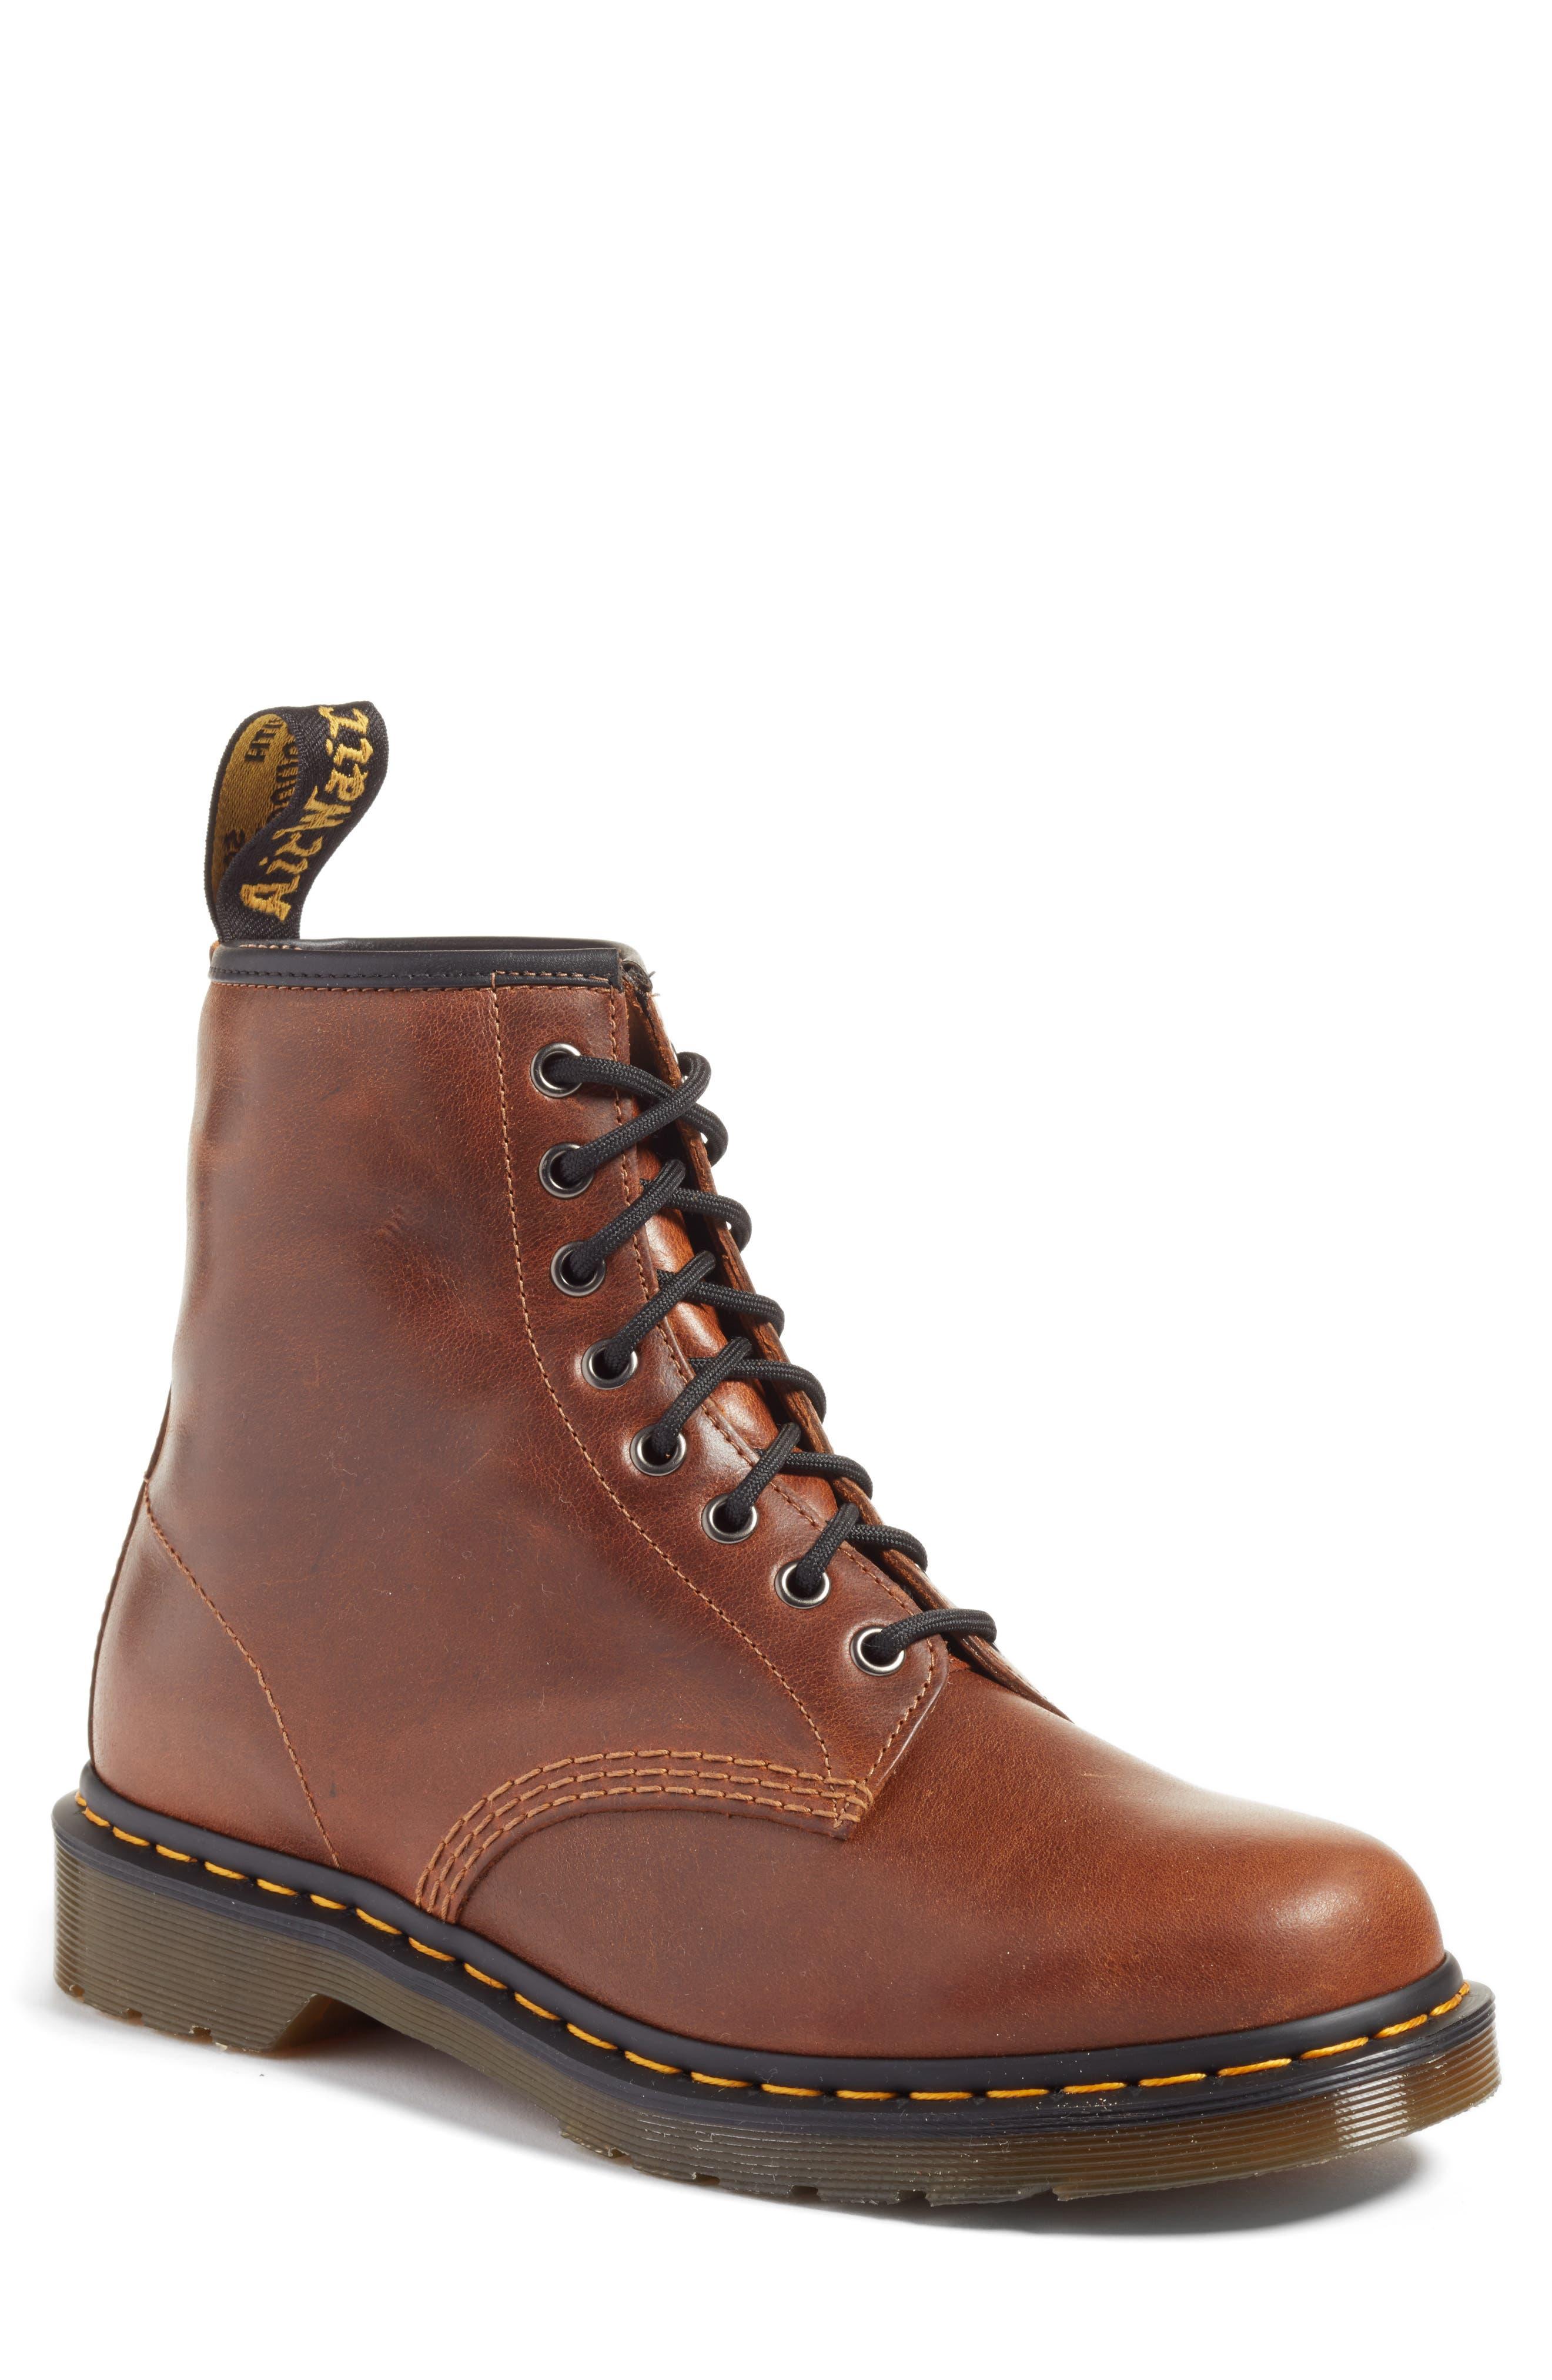 Main Image - Dr. Martens 1460 8-Eye Boot (Men)